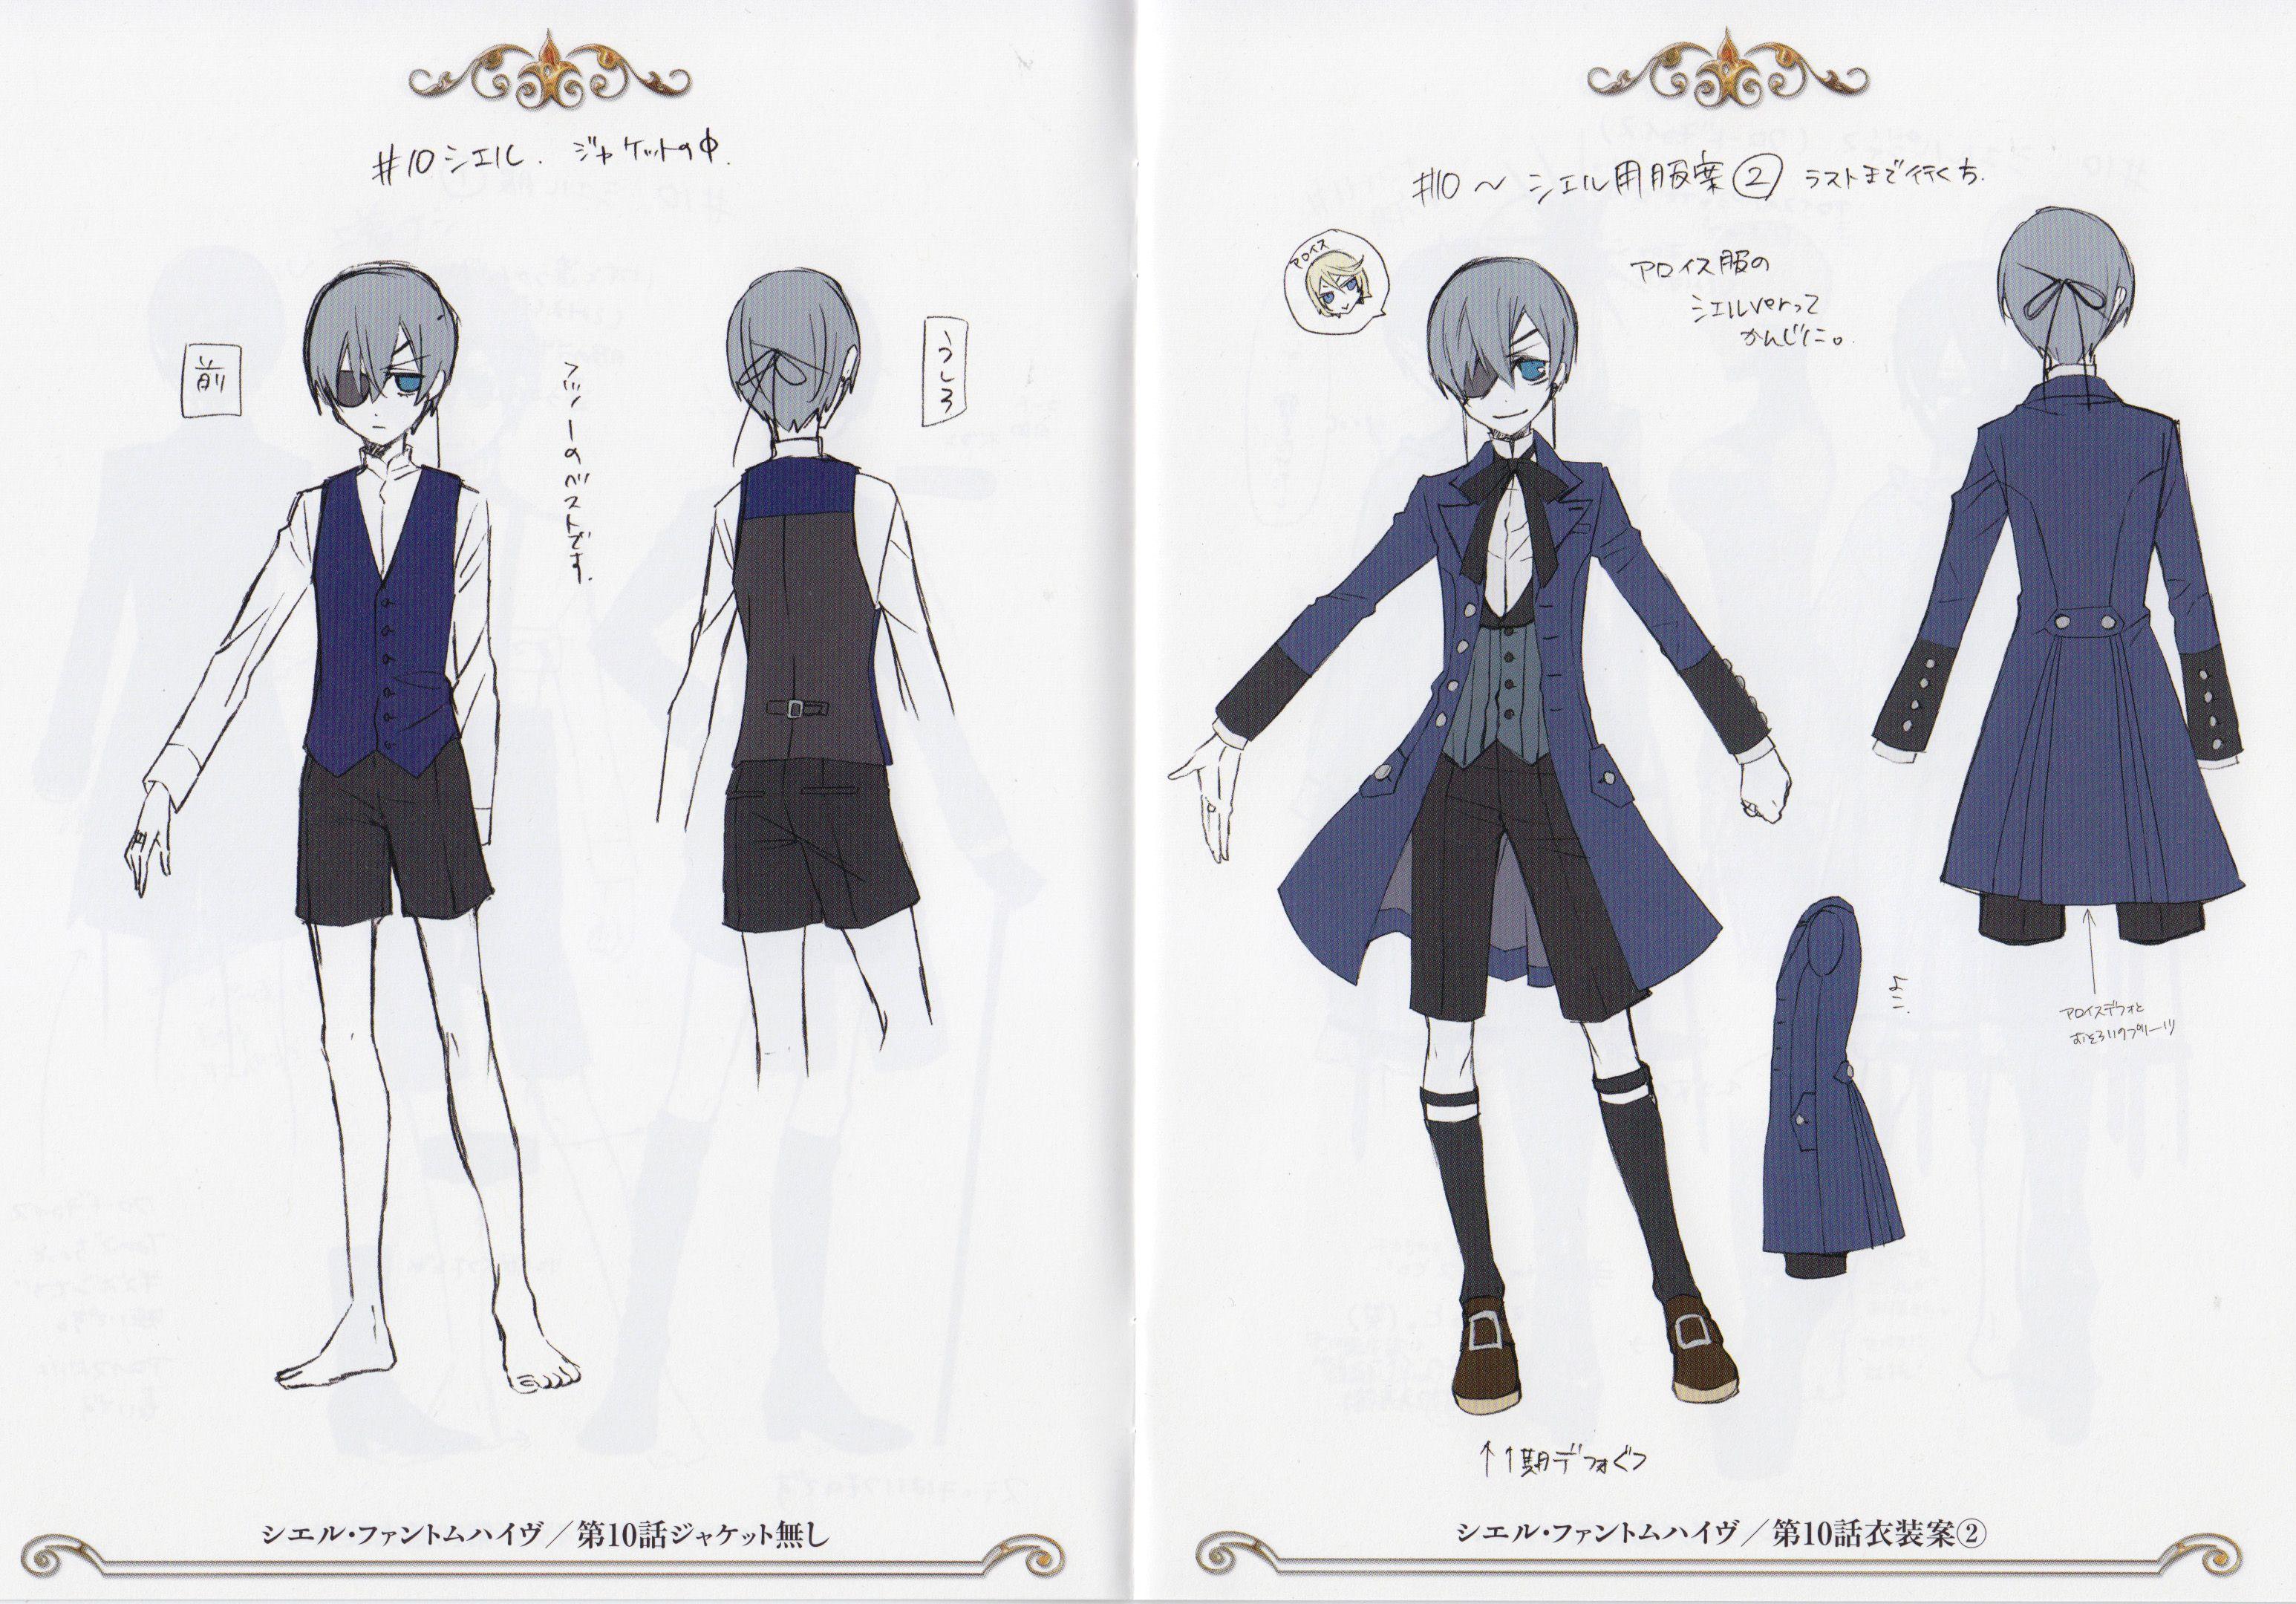 ciel phantomhive underclothing alois blue outfit